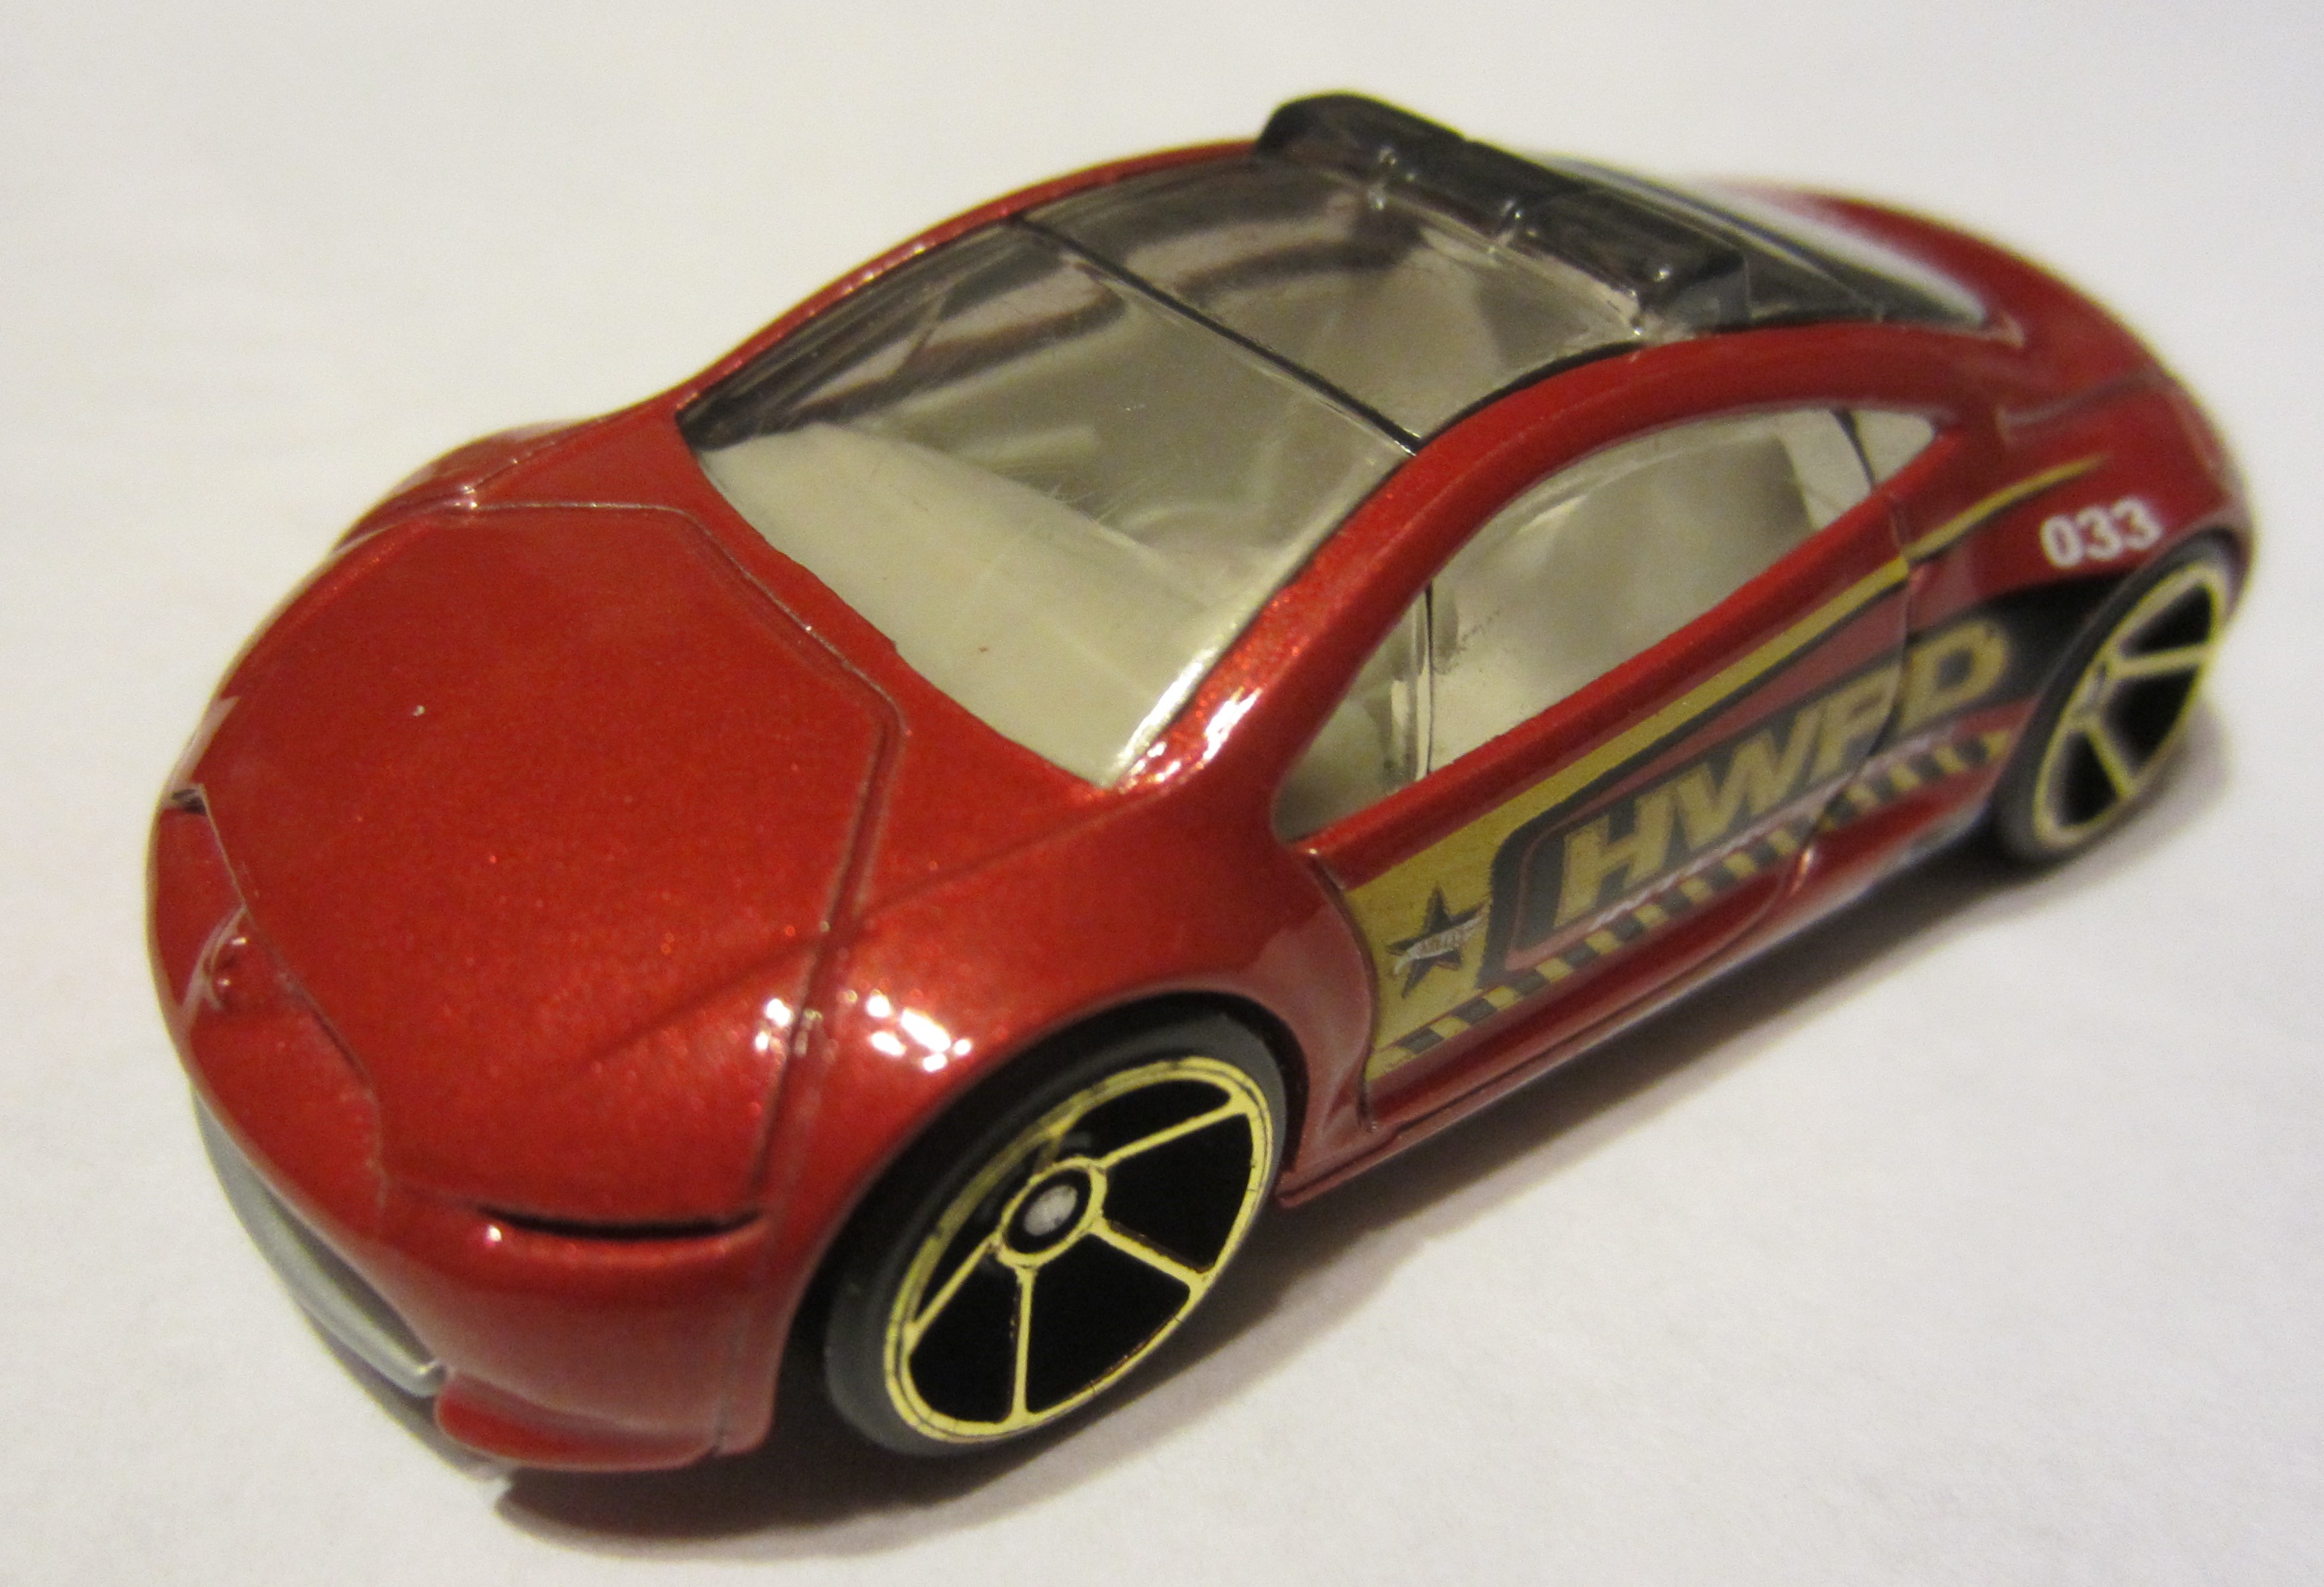 Mitsubishi Eclipse Concept Car Hot Wheels Wiki Fandom Powered By